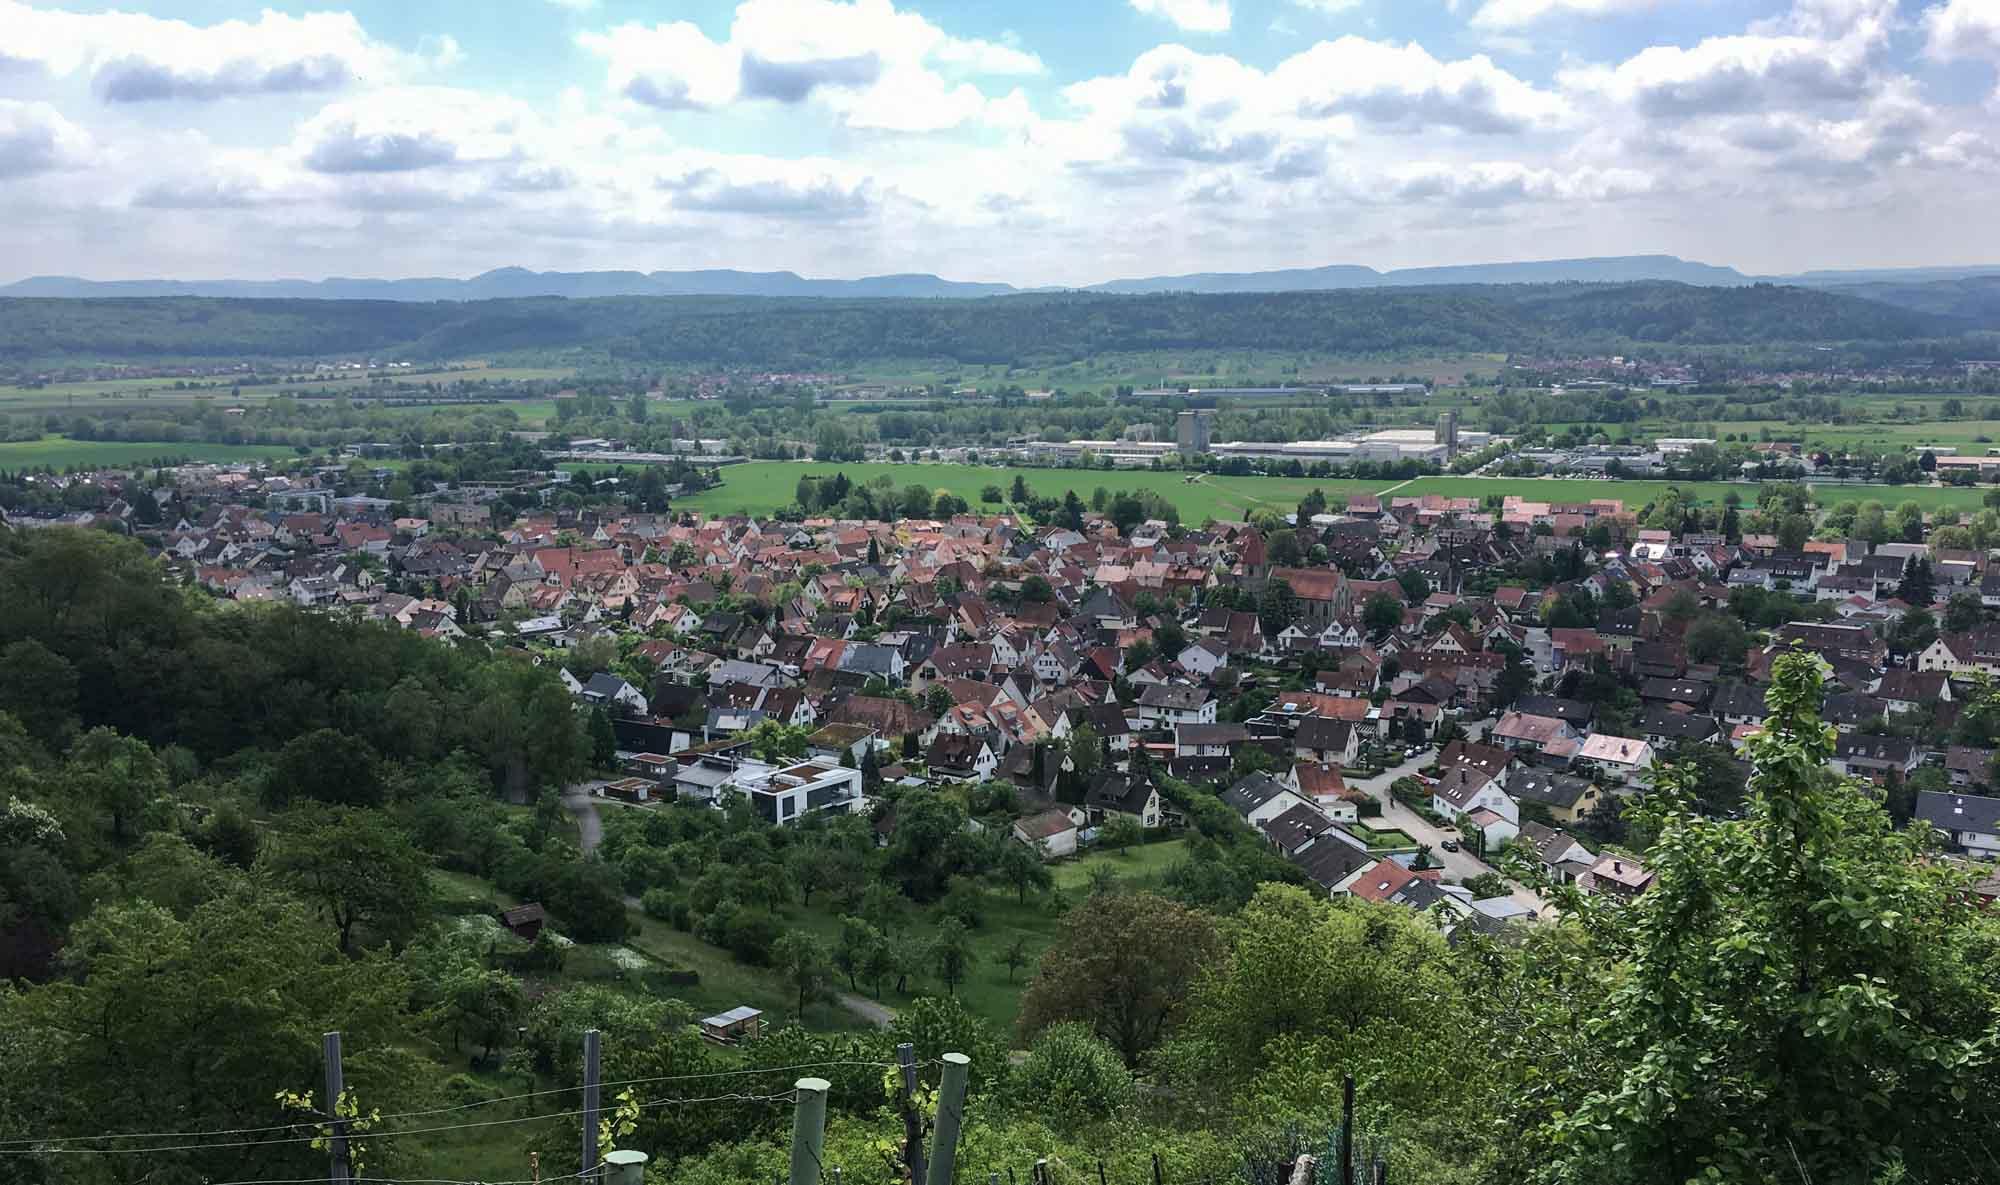 Hirschau nestled beneath Spitzberg